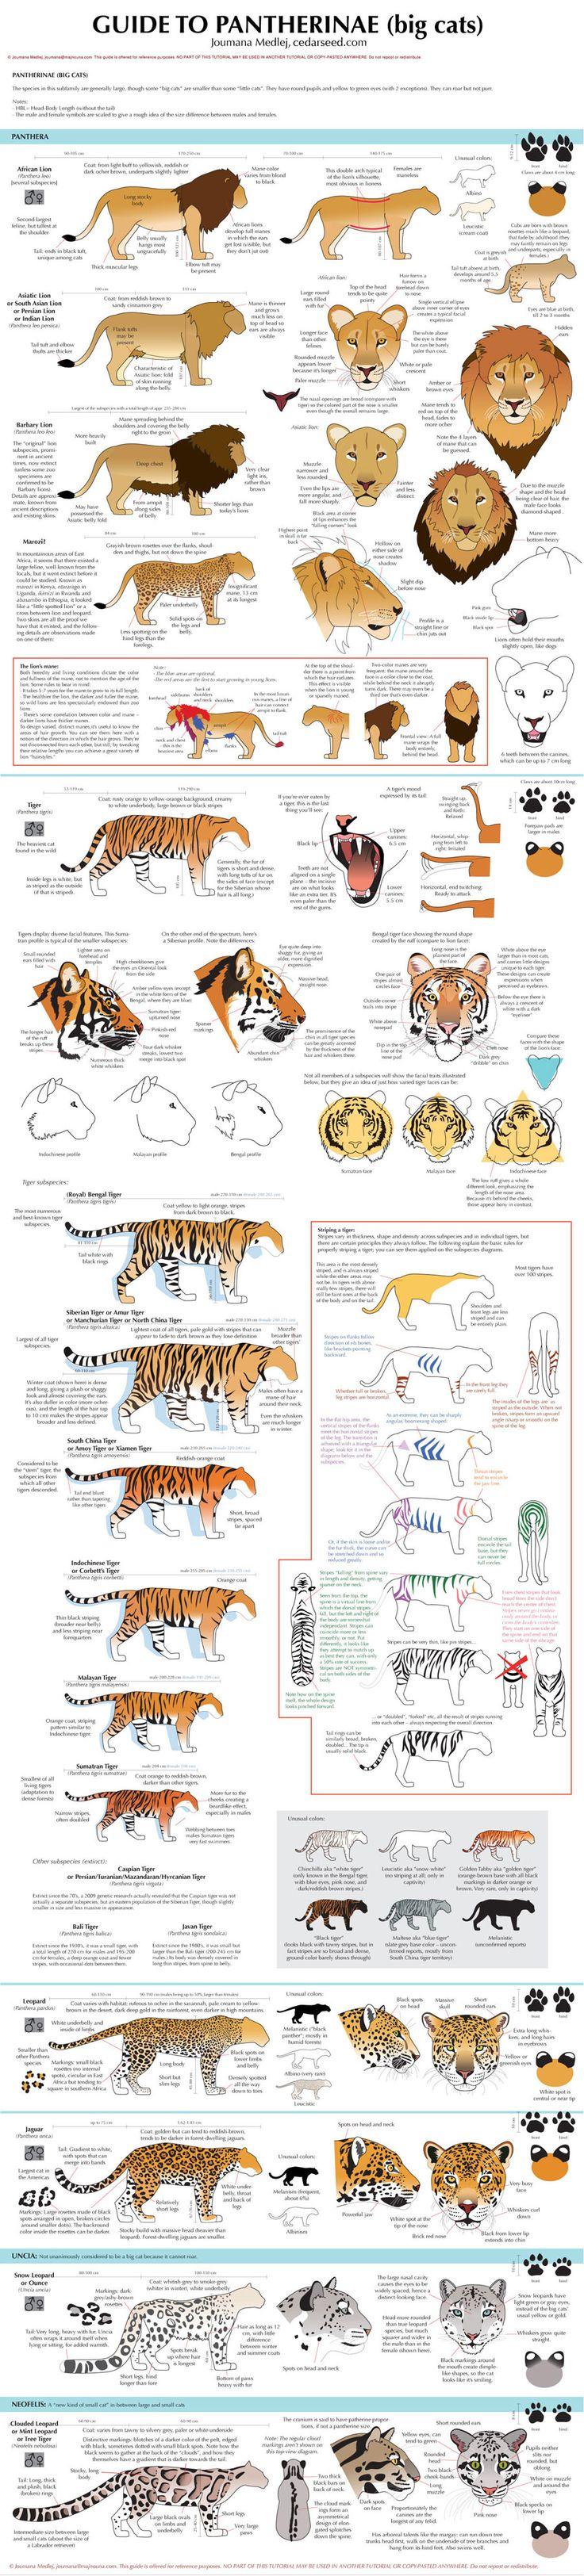 15 best Cat Anatomy images on Pinterest | Animal anatomy, Cat ...